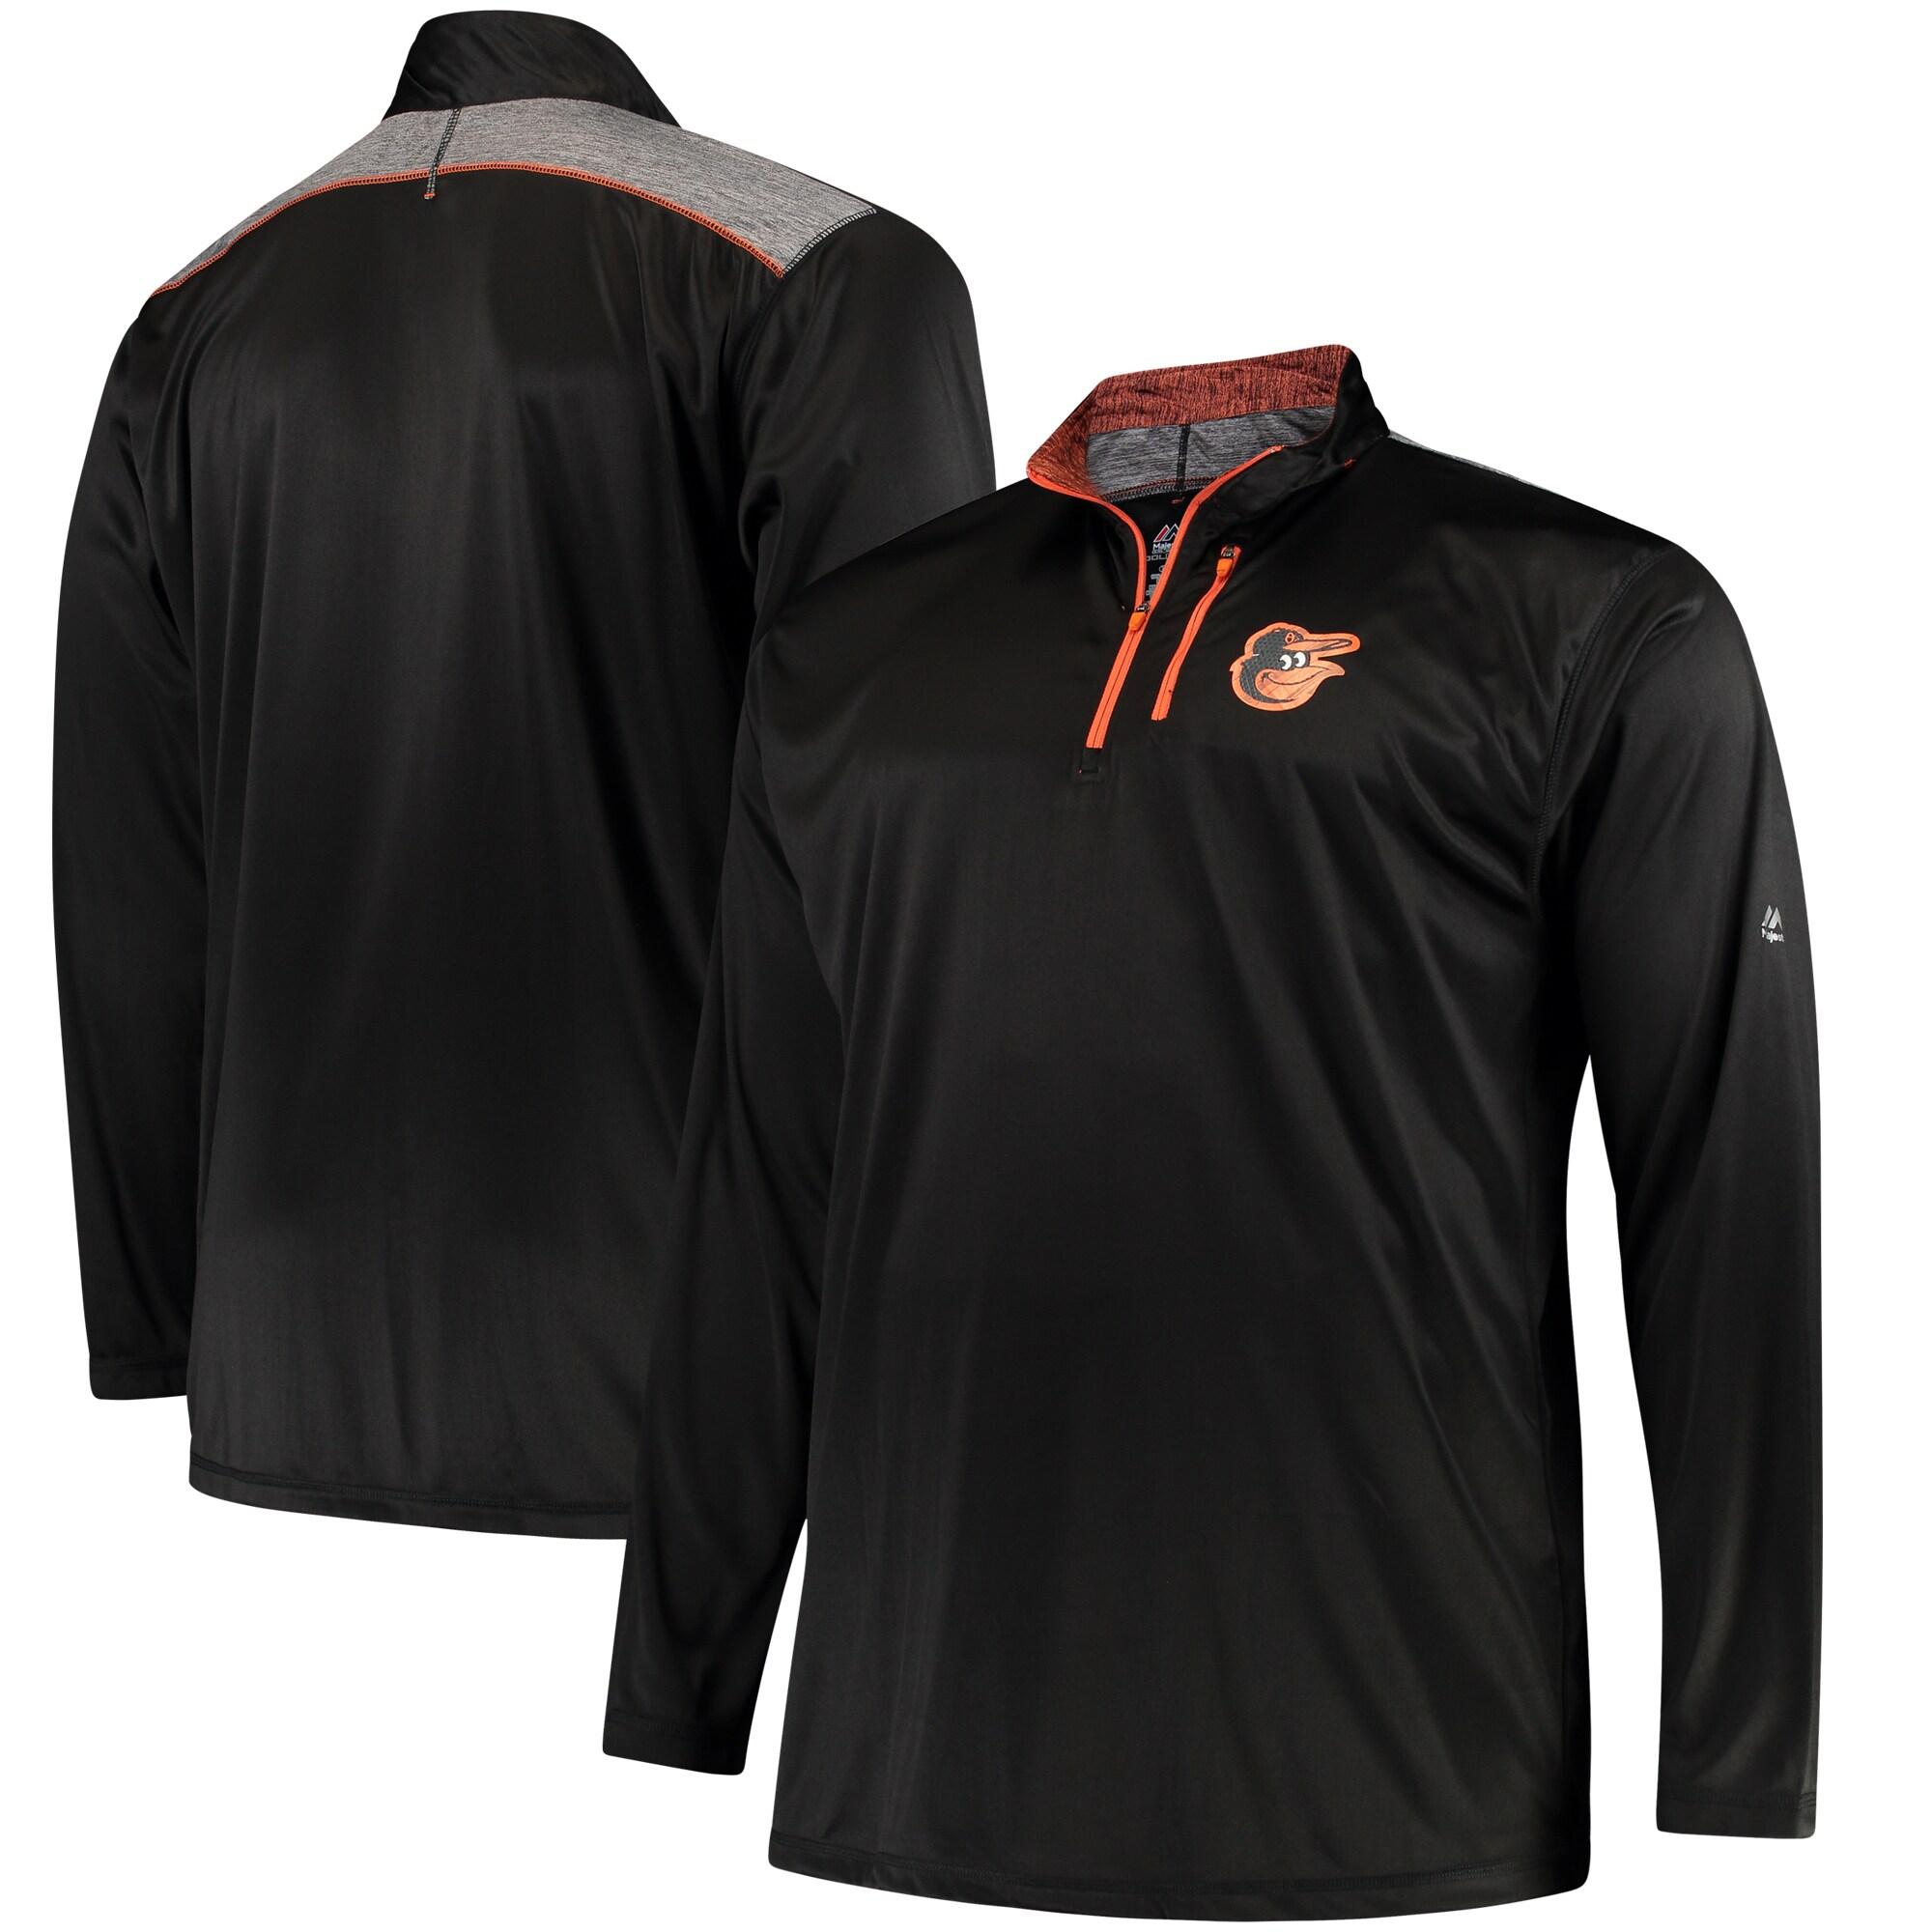 Baltimore Orioles Majestic Big & Tall 643 Half-Zip Pullover Jacket - Black